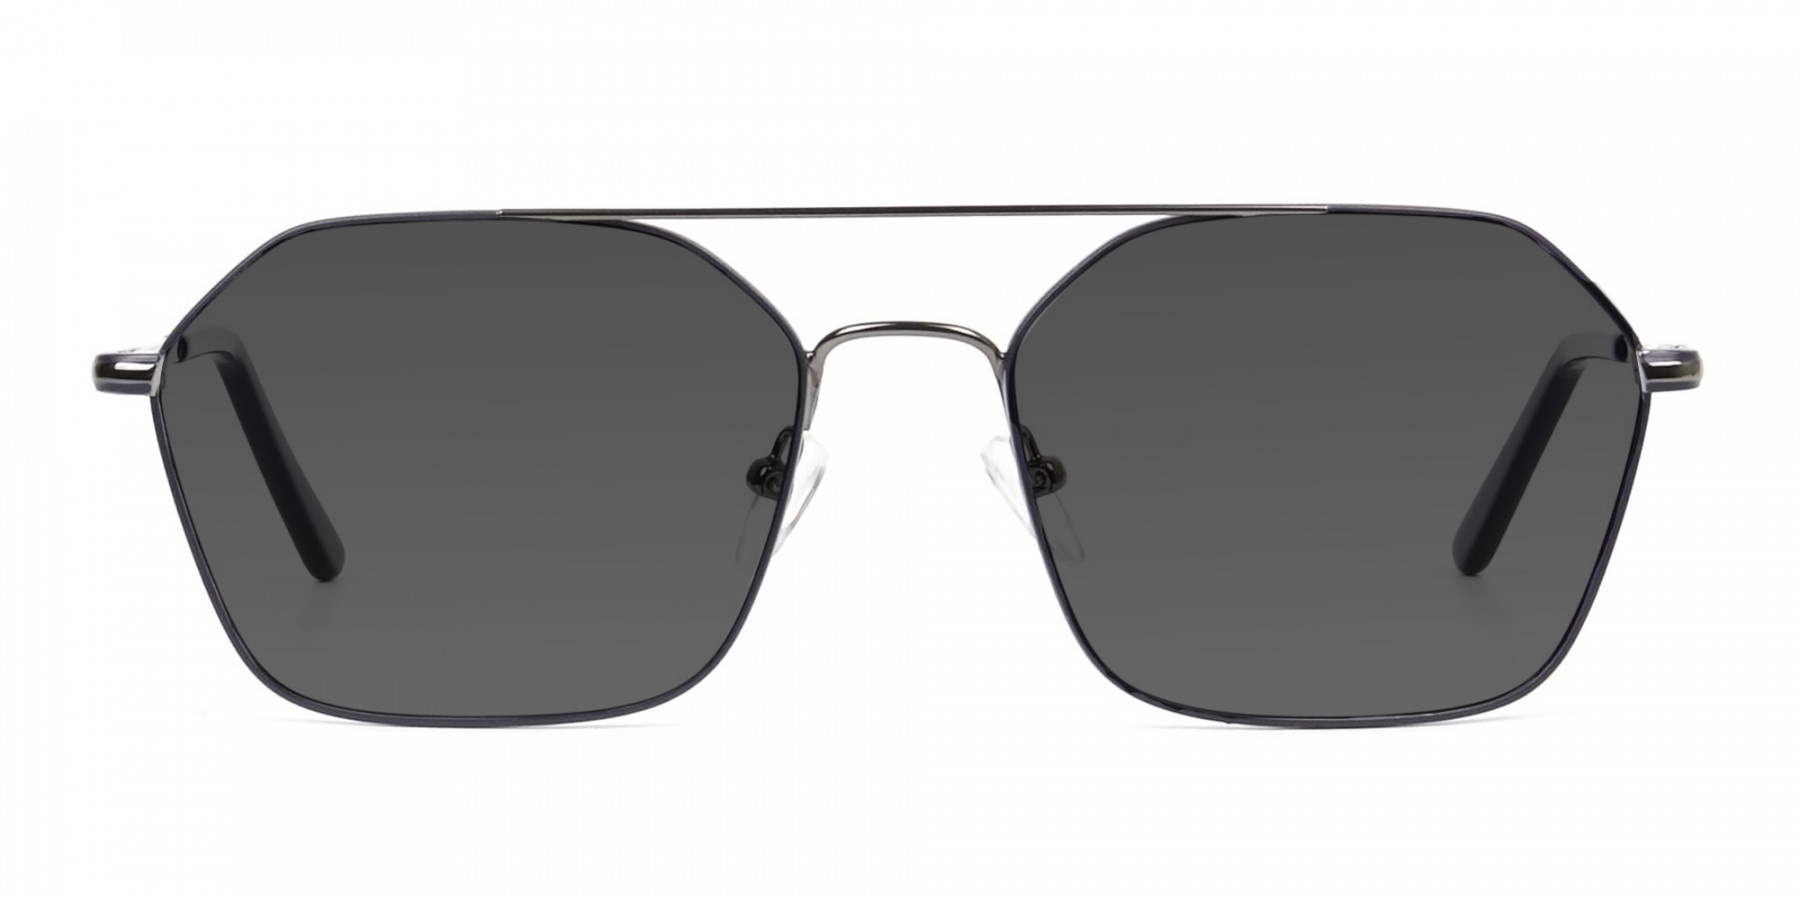 dark-royal-blue-geometric -gunmetal-aviator-grey-tinted-sunglasses-3